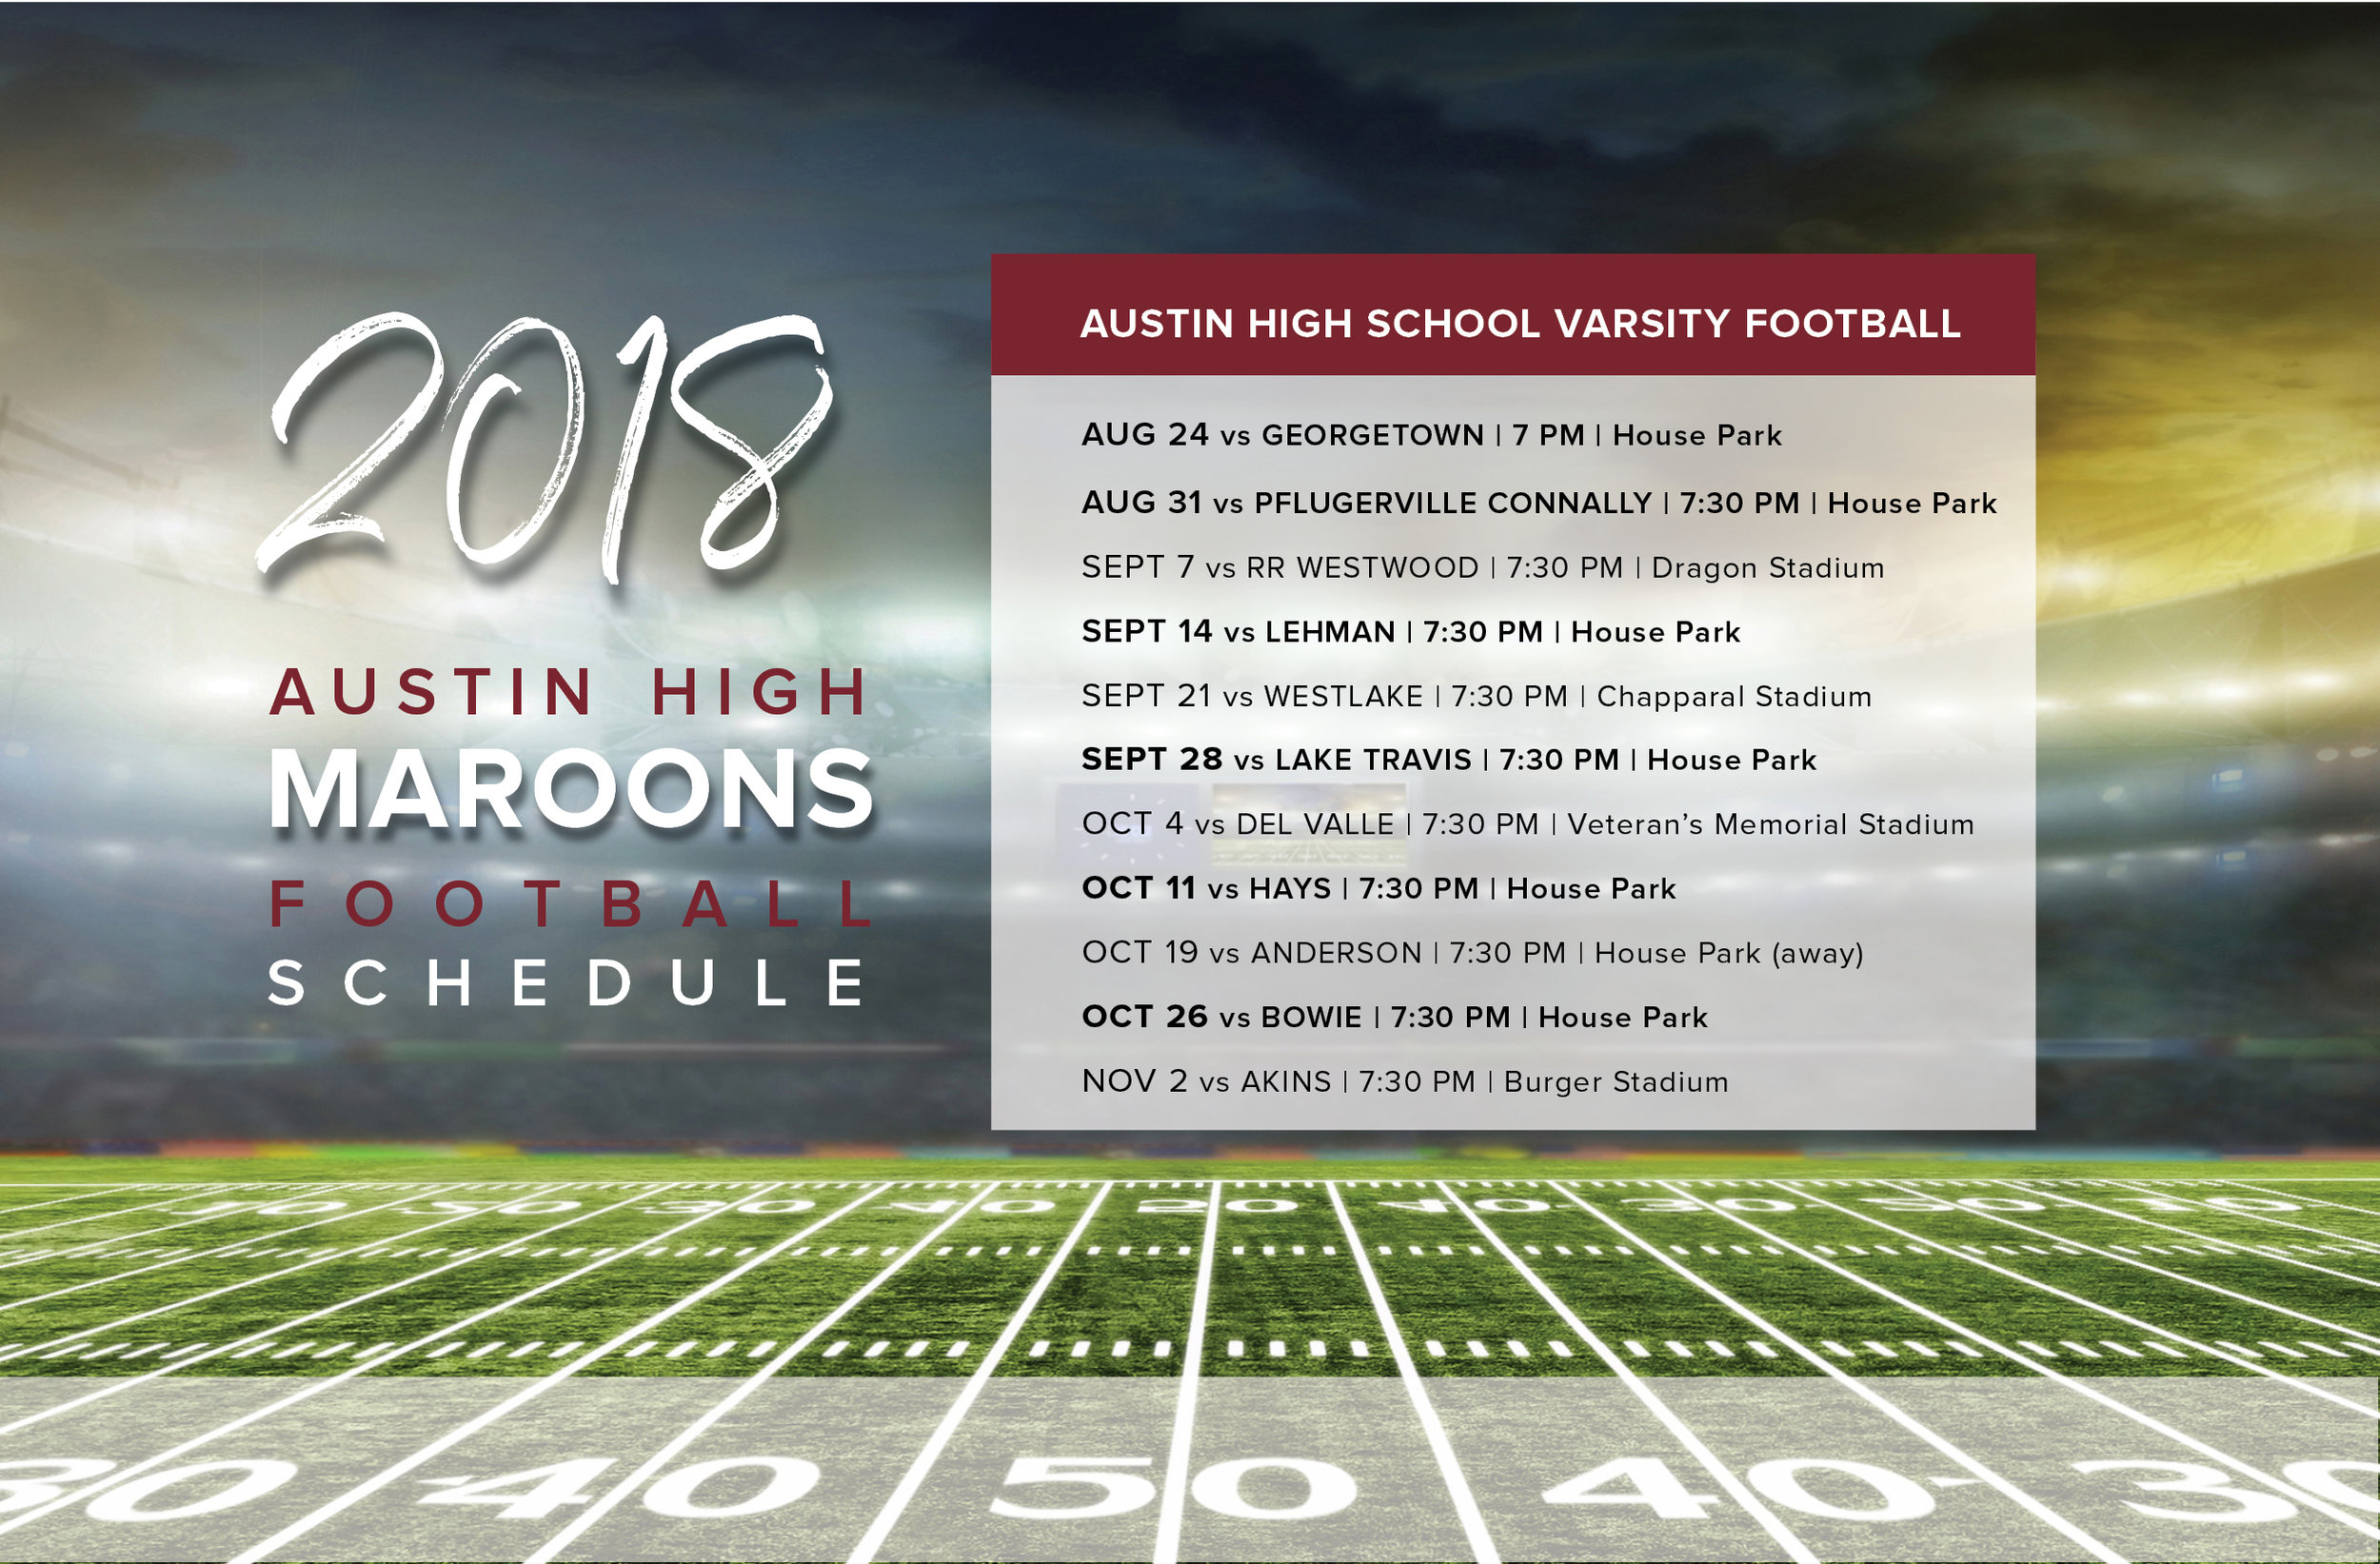 Austin High School Football Schedule Fall 2018